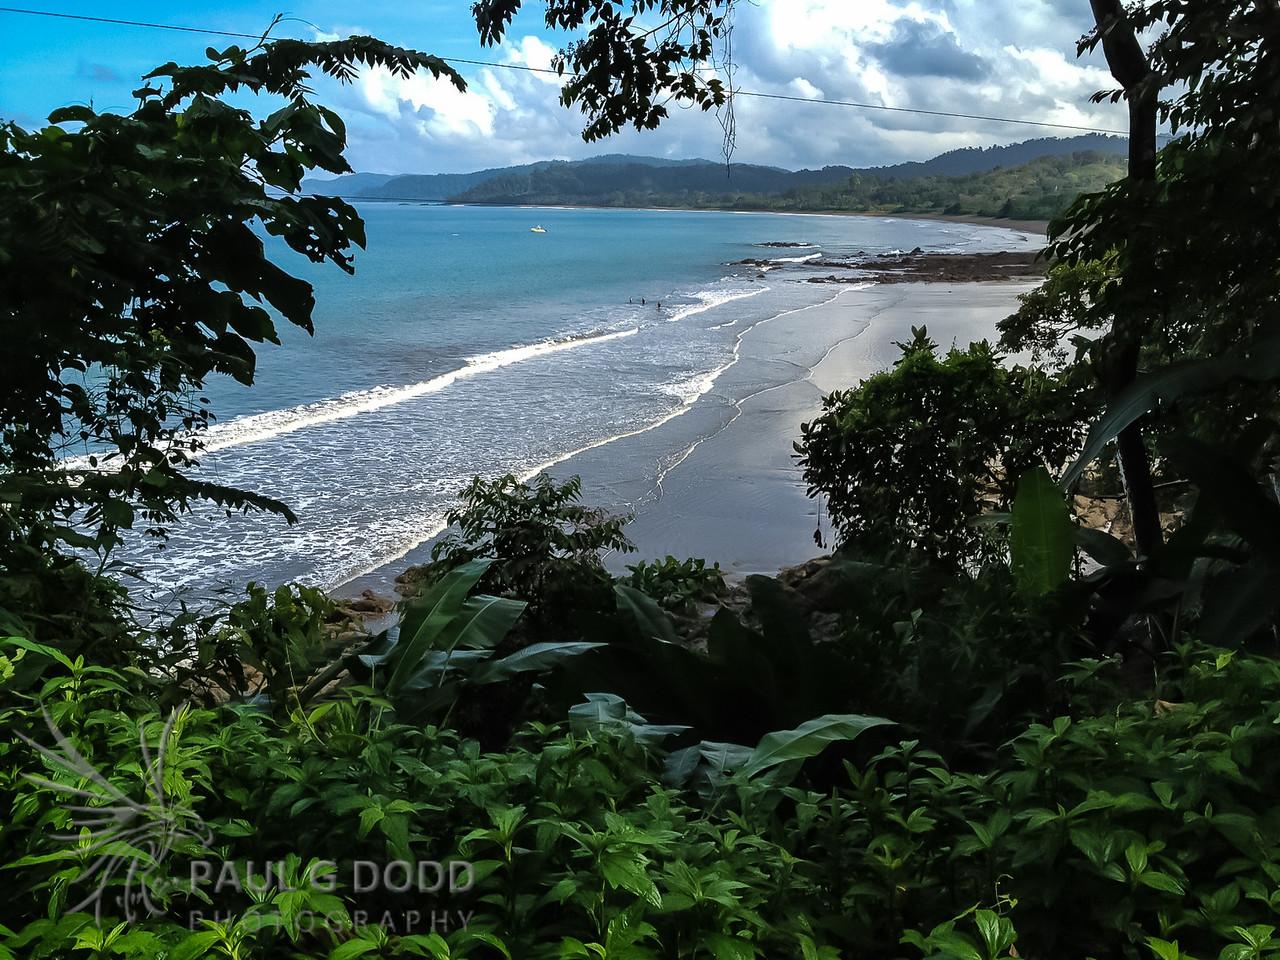 The beautiful Drake Bay